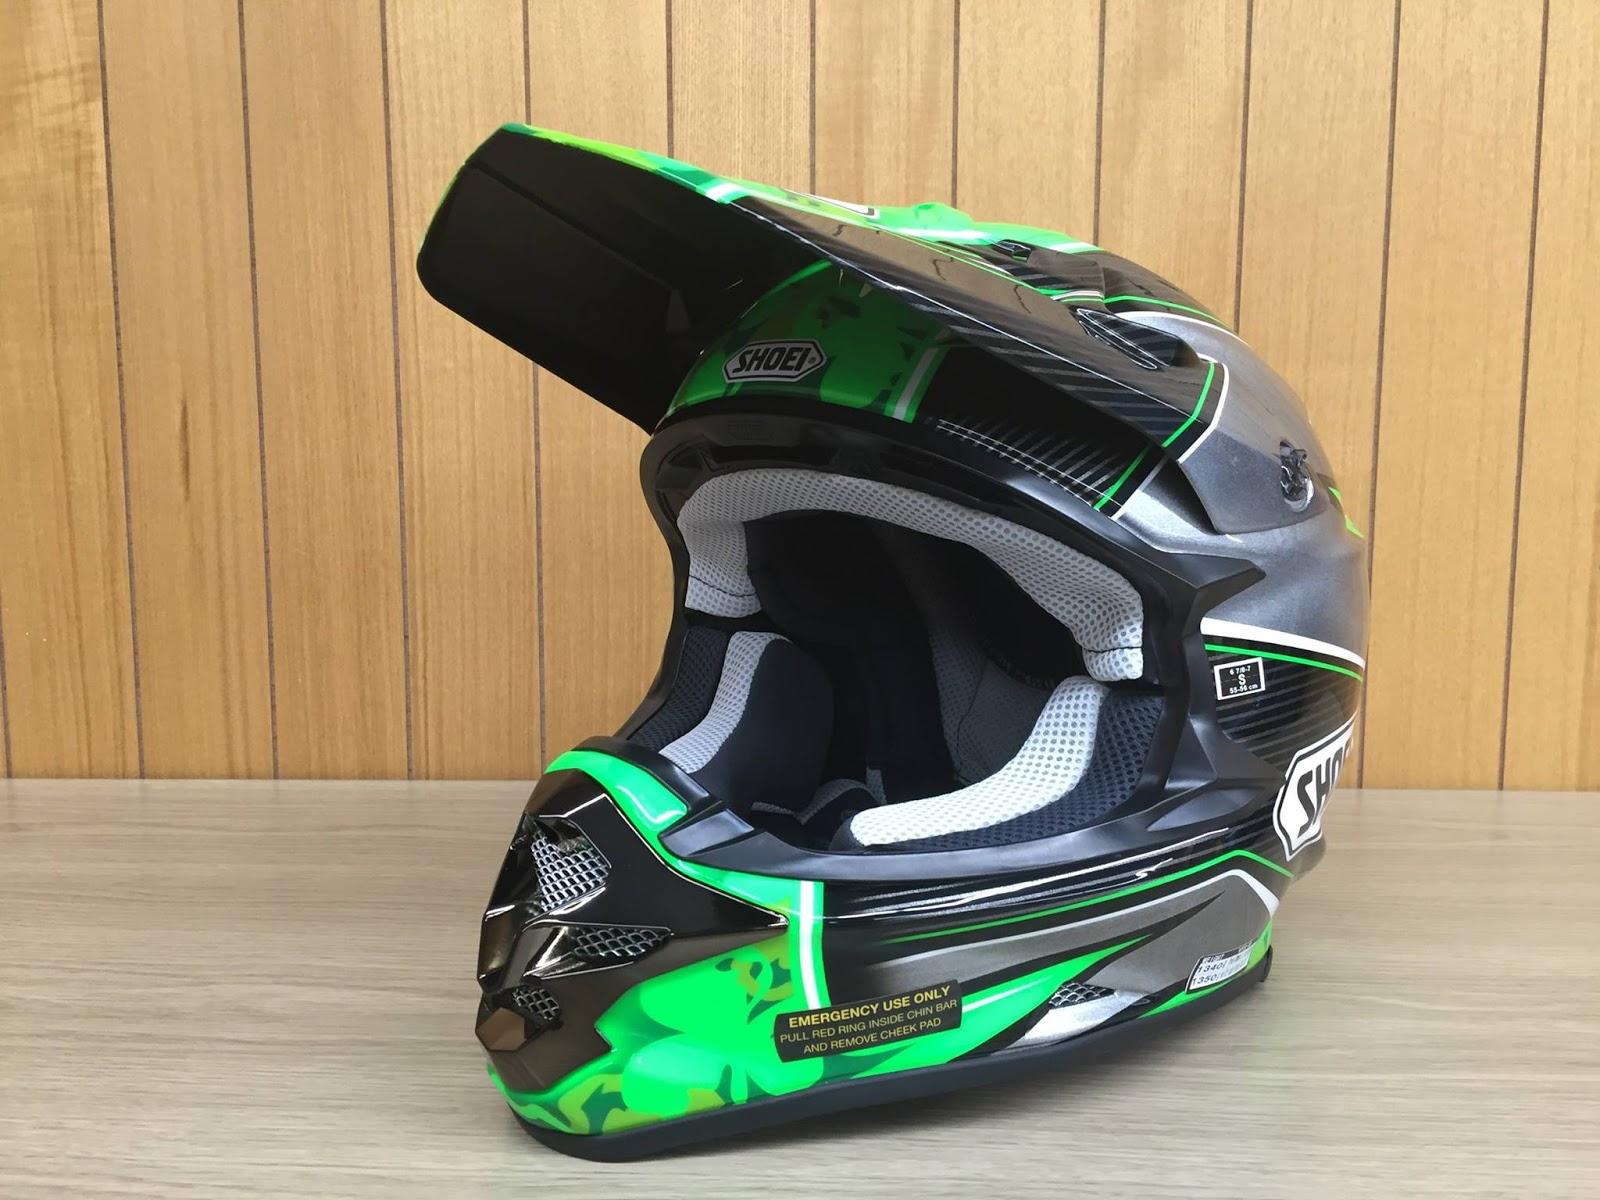 racing helmets garage shoei vfx w e laverty 2016. Black Bedroom Furniture Sets. Home Design Ideas